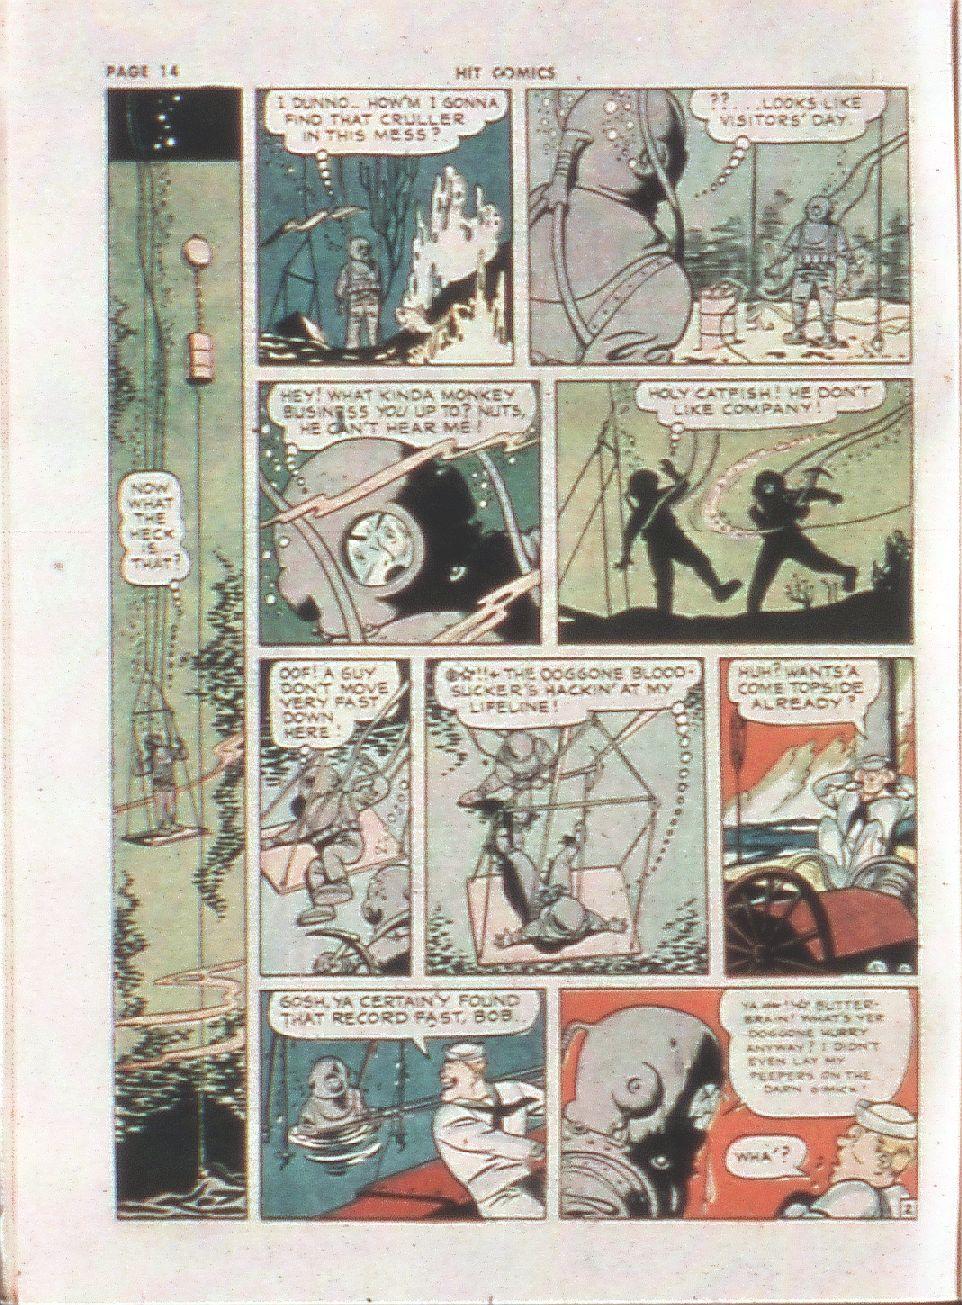 Read online Hit Comics comic -  Issue #21 - 16